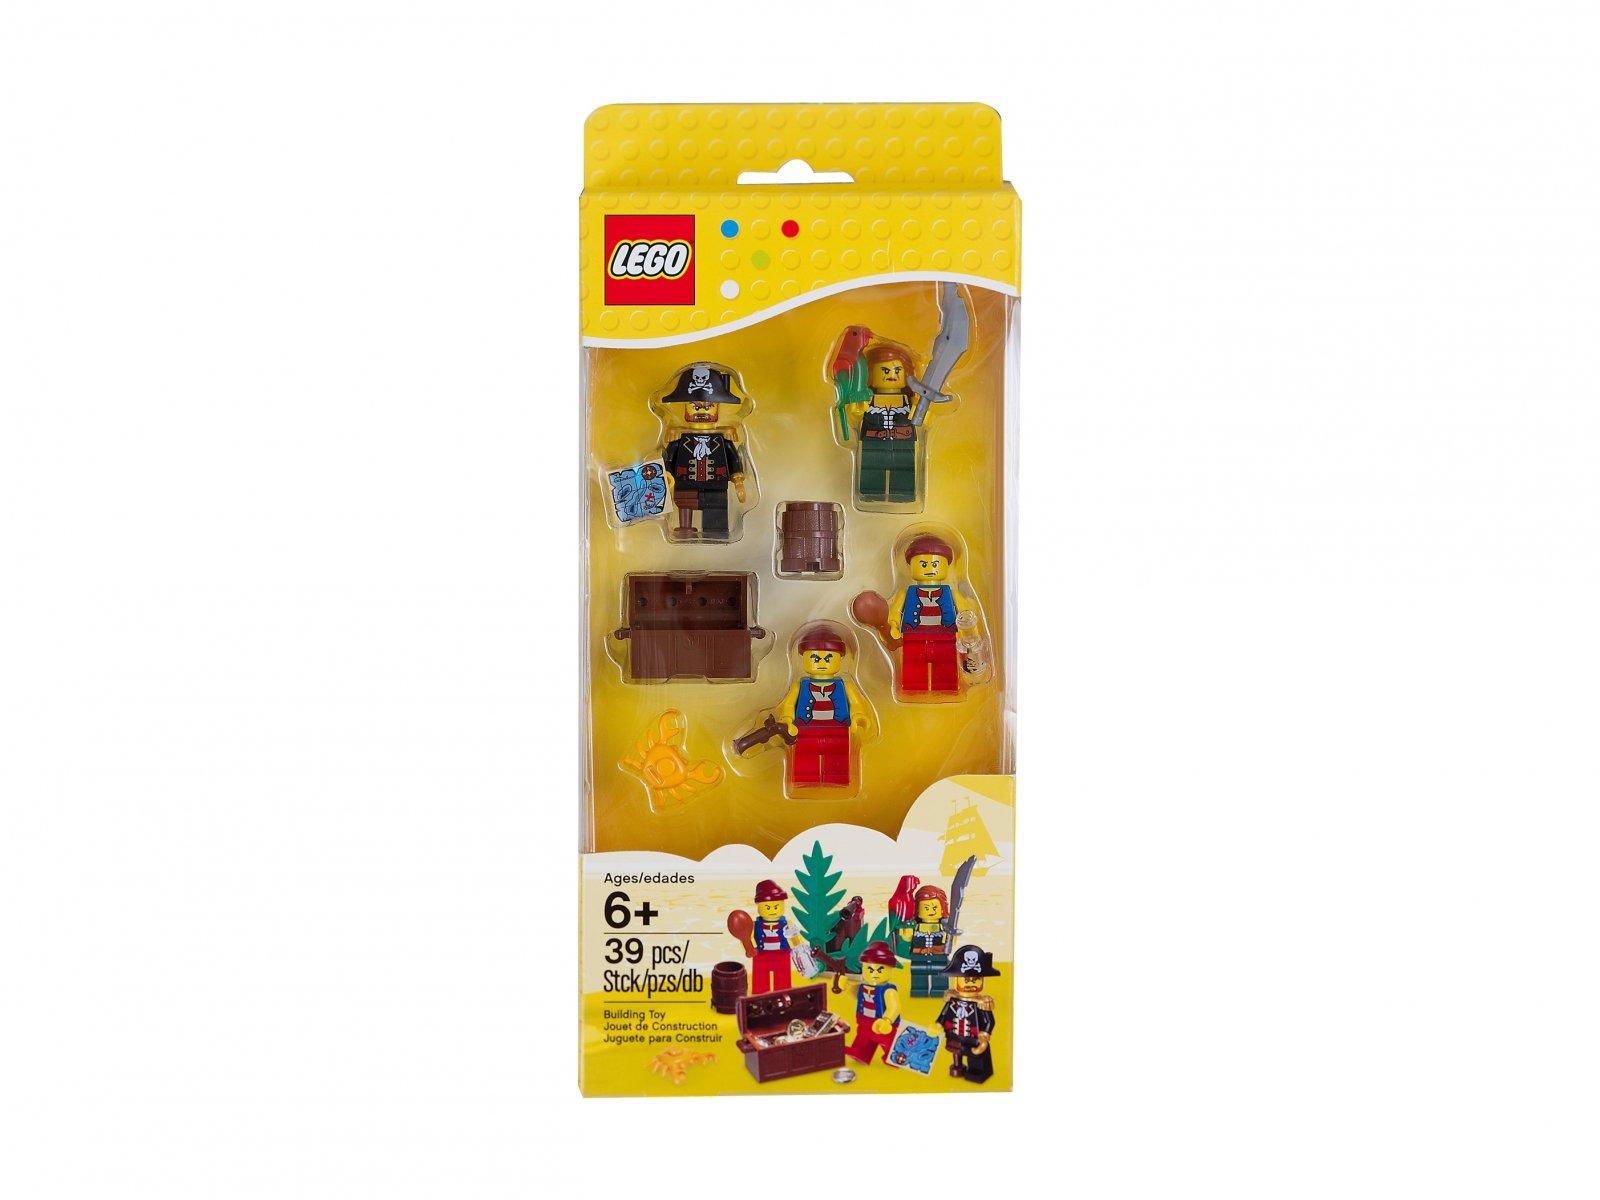 LEGO 850839 Classic Pirate Set